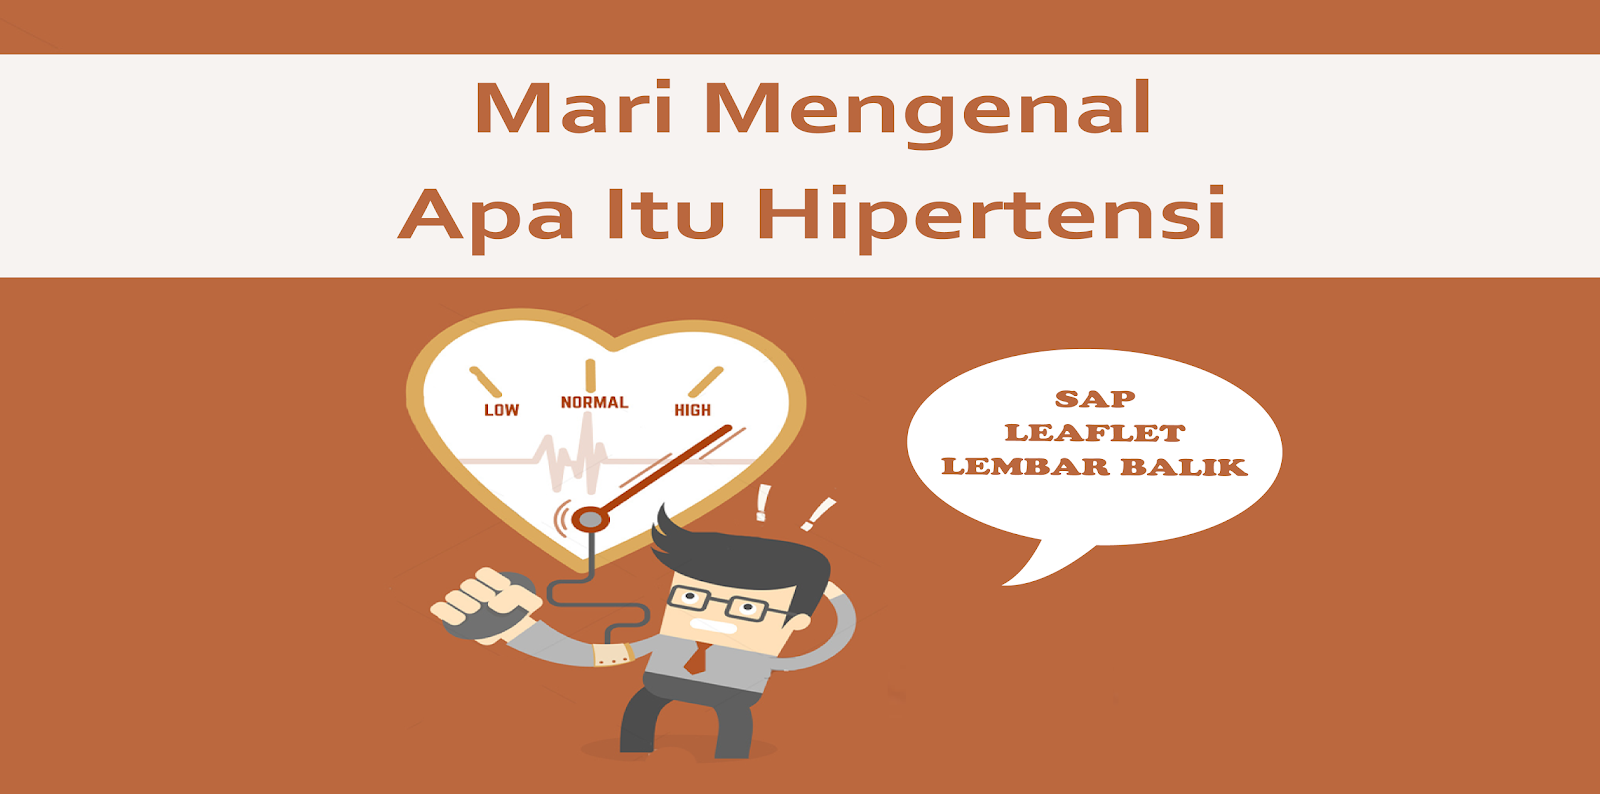 SAP, Leaflet, dan Lembar Balik Hipertensi